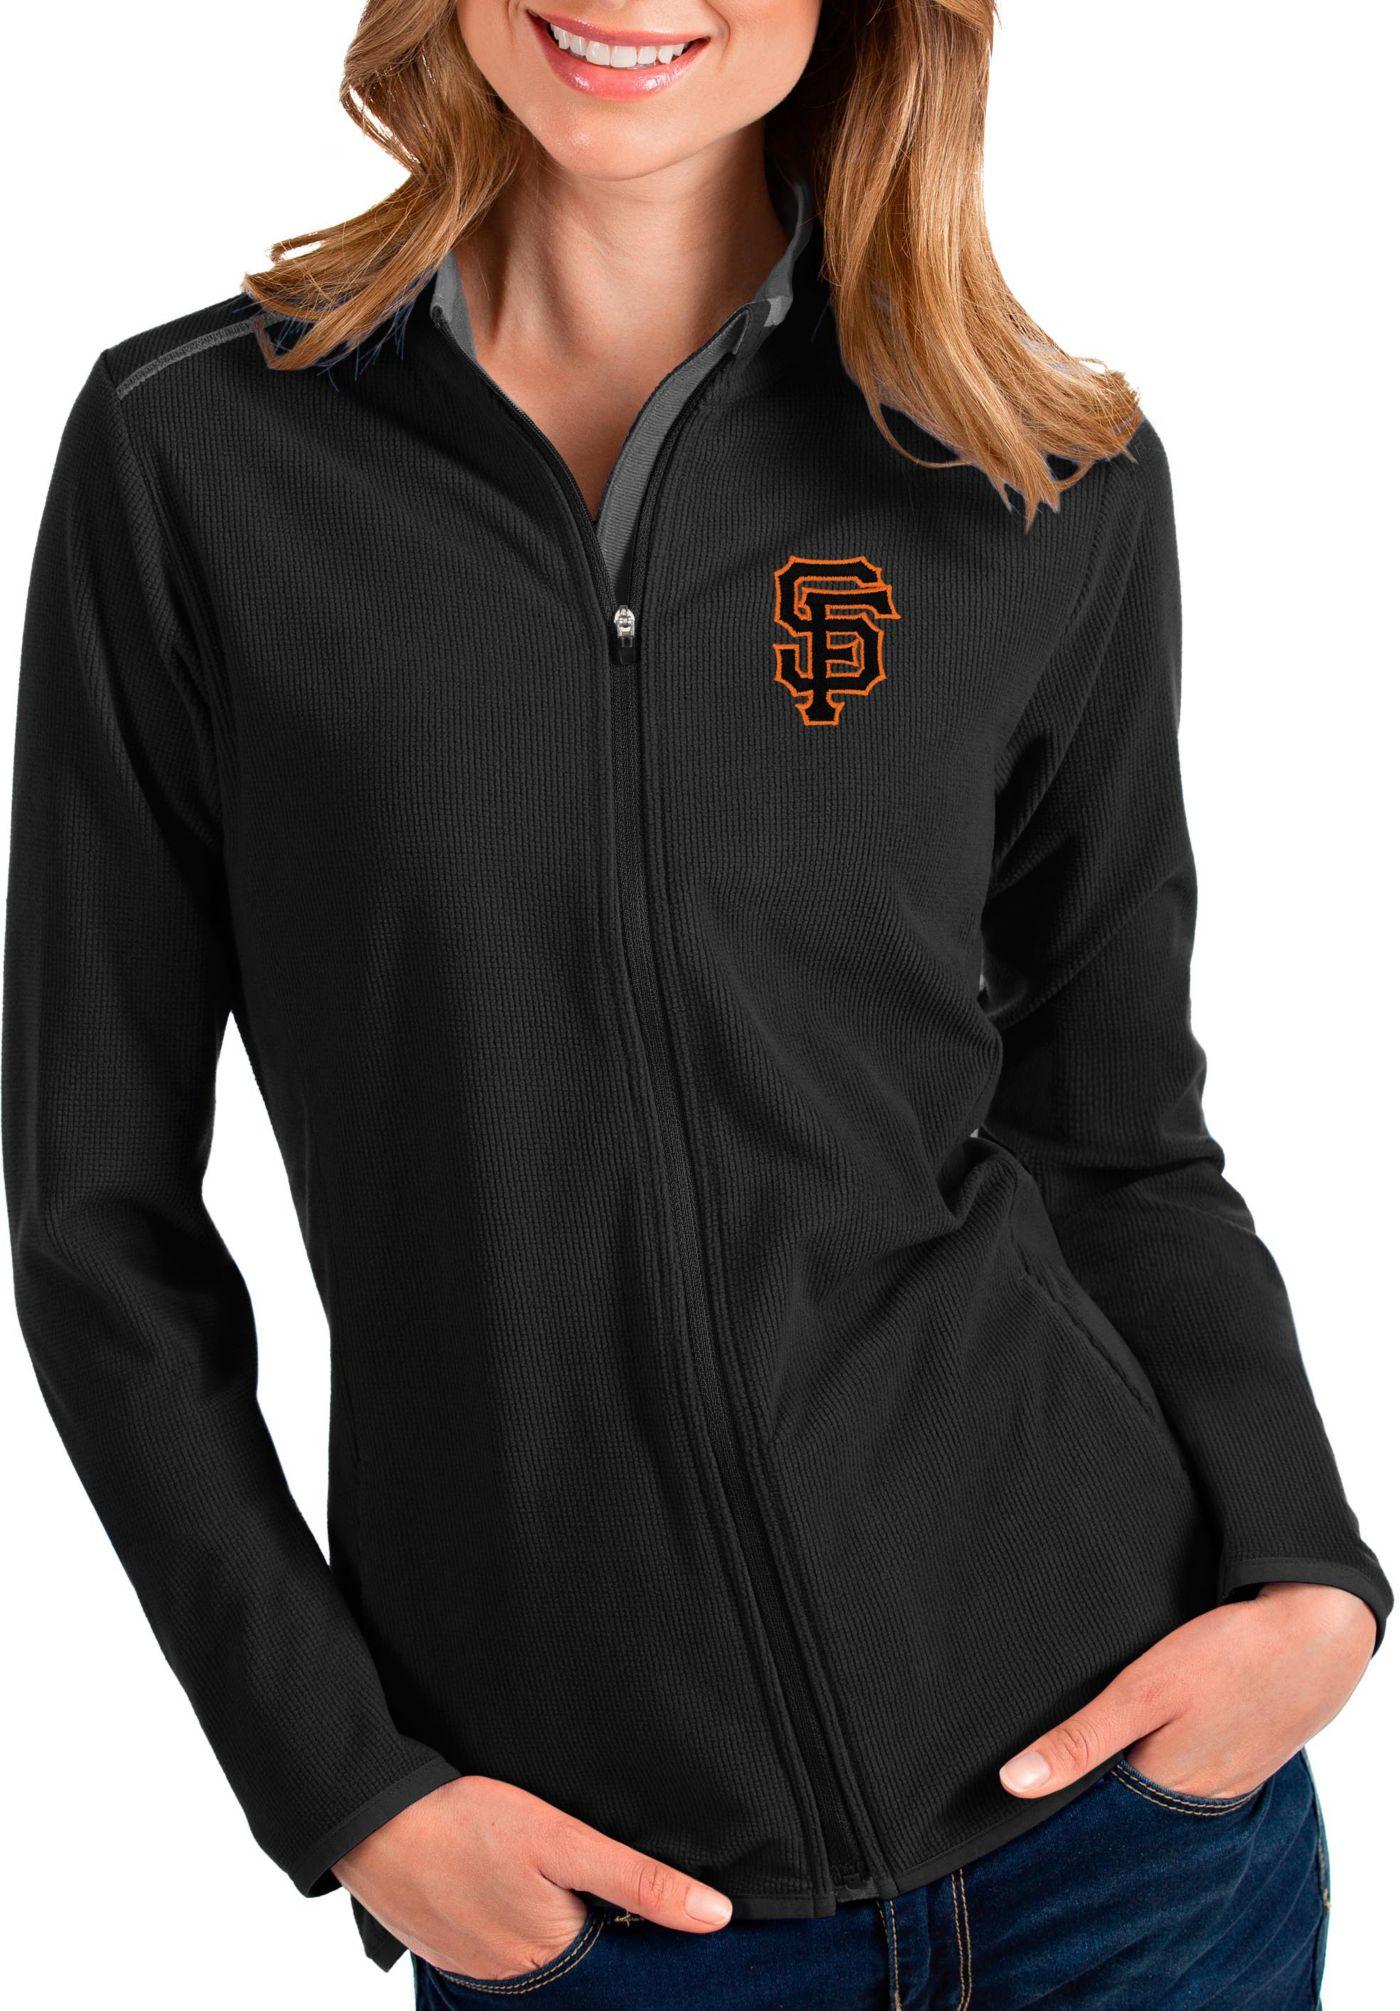 Antigua Women's San Francisco Giants Black Glacier Full-Zip Jacket